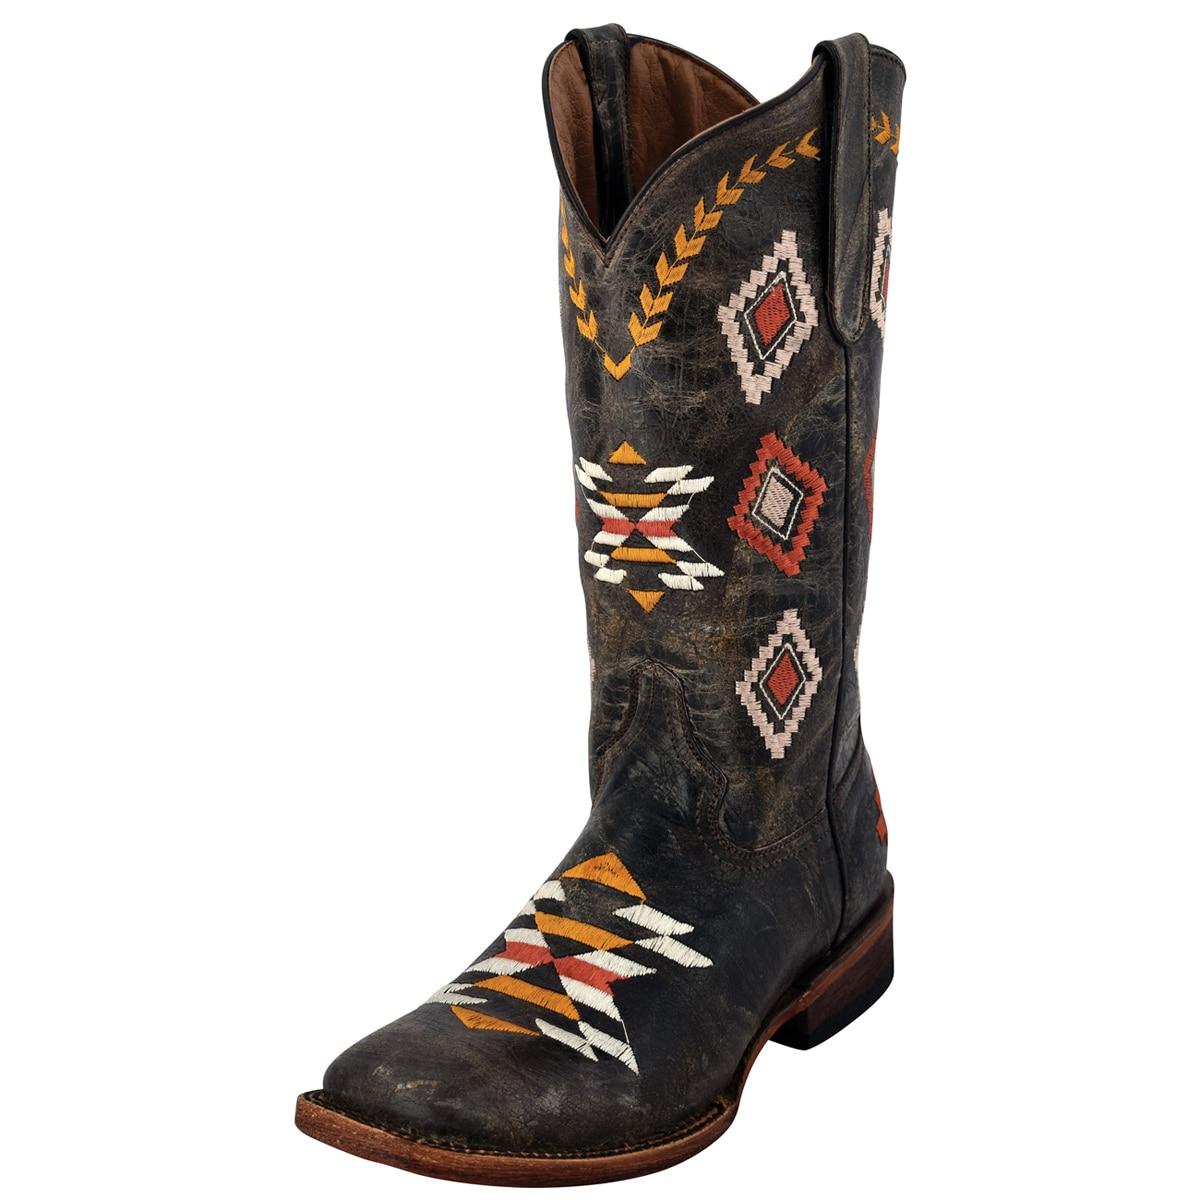 97c6eae26 Save On Select Ferrini Boots - SmartPak